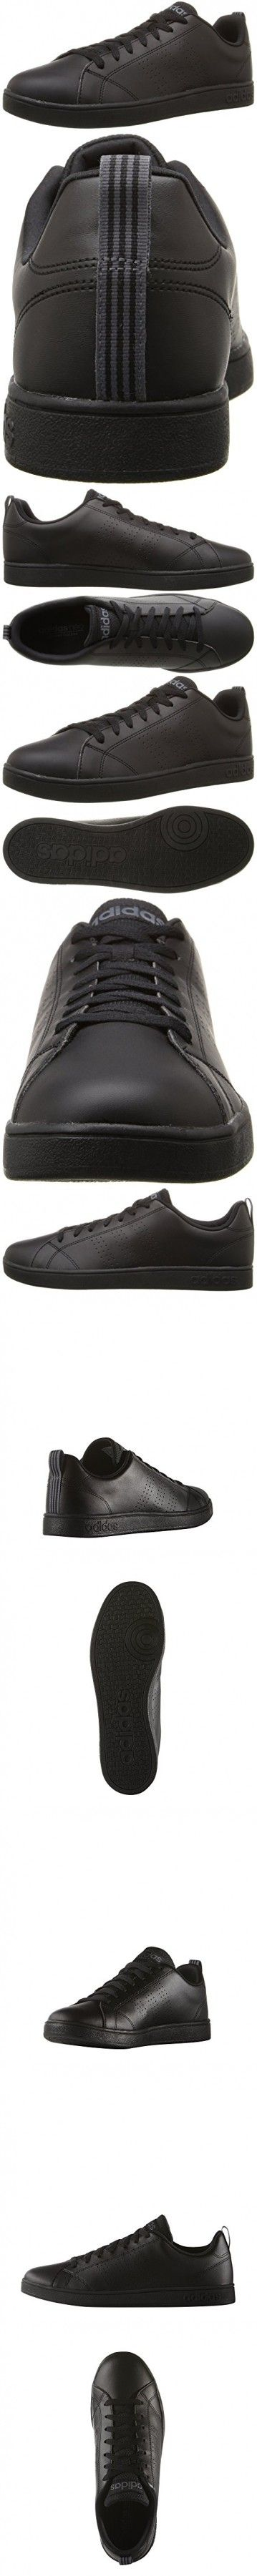 Adidas NEO Men's Advantage Clean VS Fashion Sneaker, Black/Black/Lead, 7.5 M US